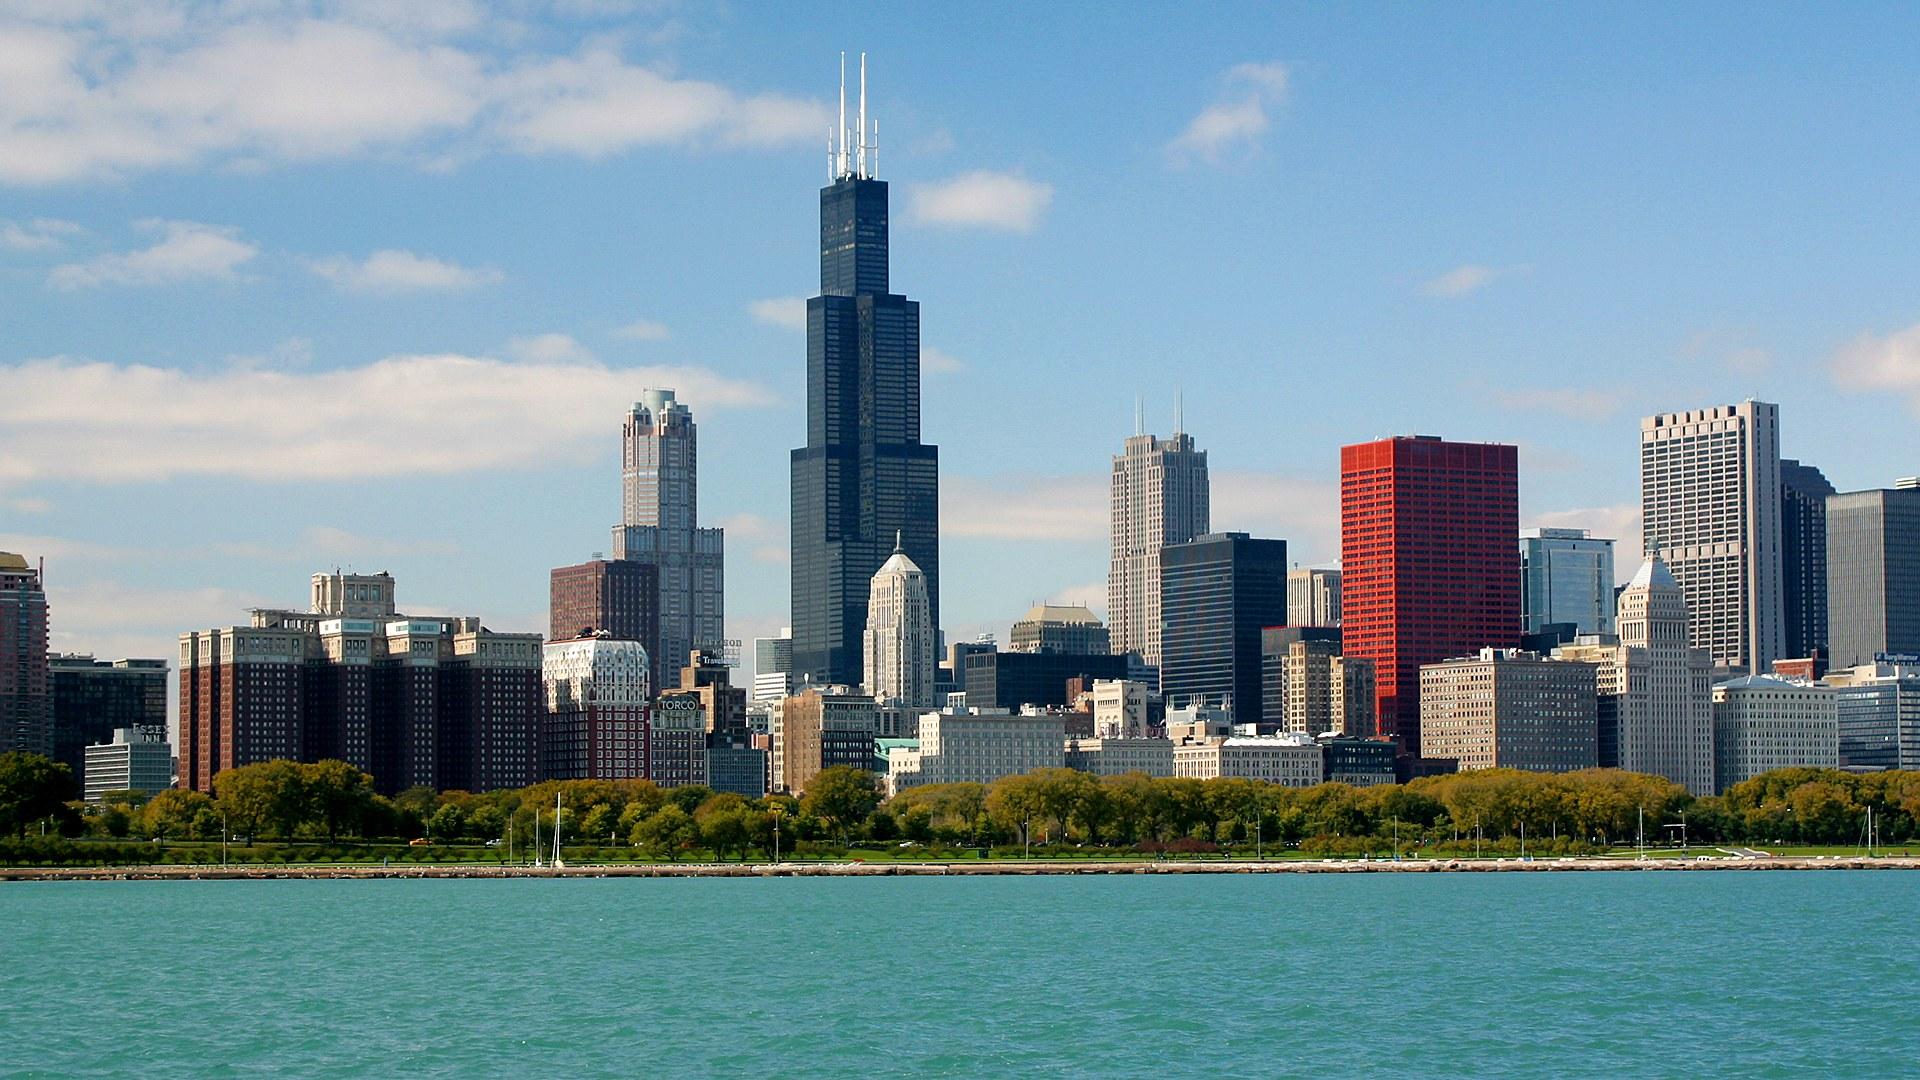 1920x1080px chicago skyline wallpaper wallpapersafari - Chicago skyline wallpaper 1920x1080 ...